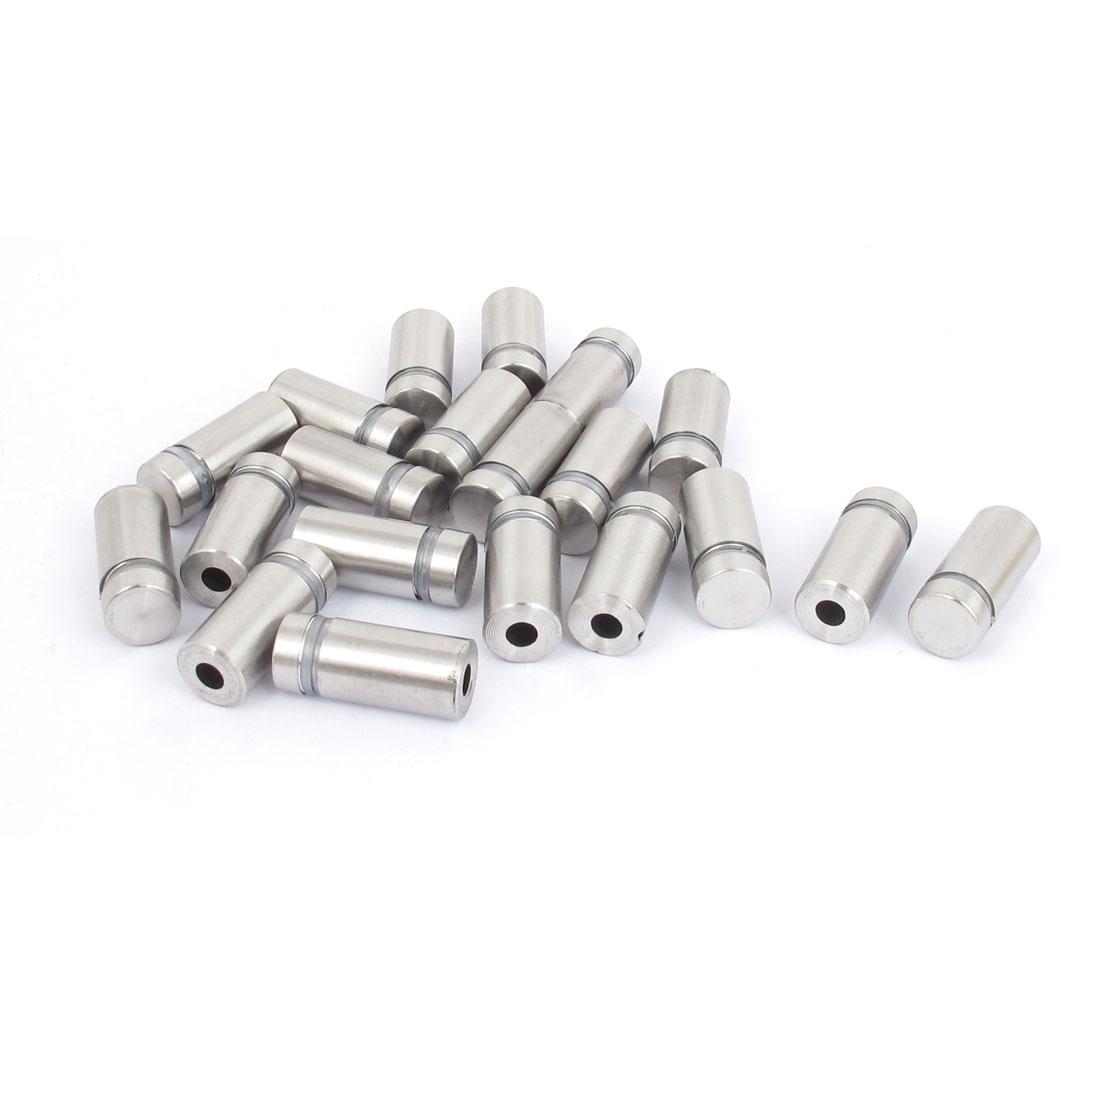 12mm x 25mm Stainless Steel Advertising Frameless Glass Standoff Pins 20pcs